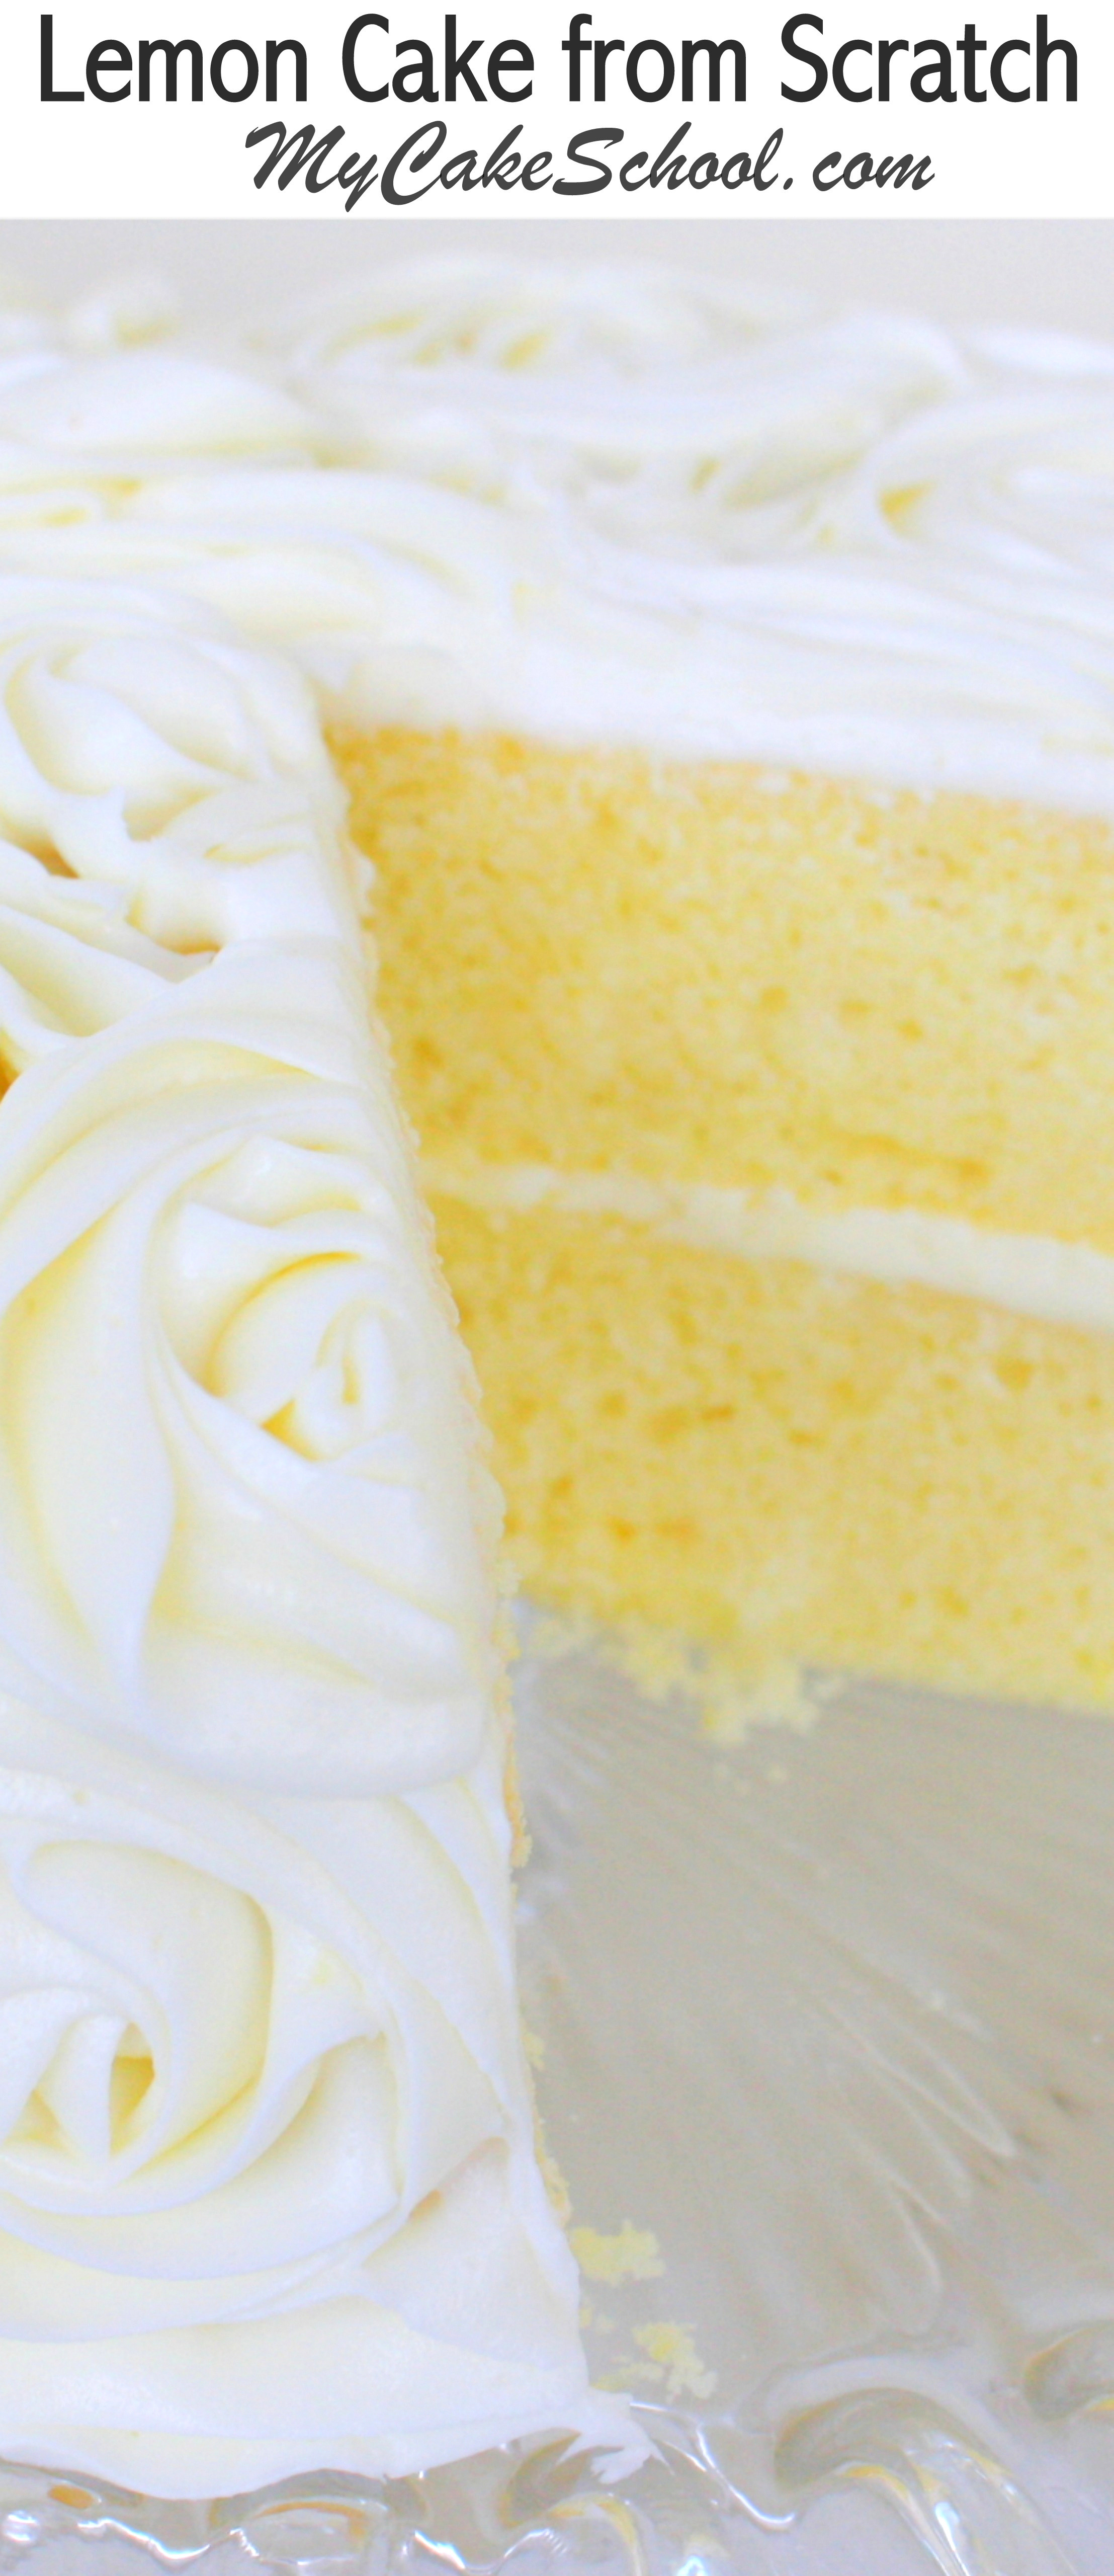 Lemon Cake Recipes From Scratch  Lemon Cake A Scratch Recipe